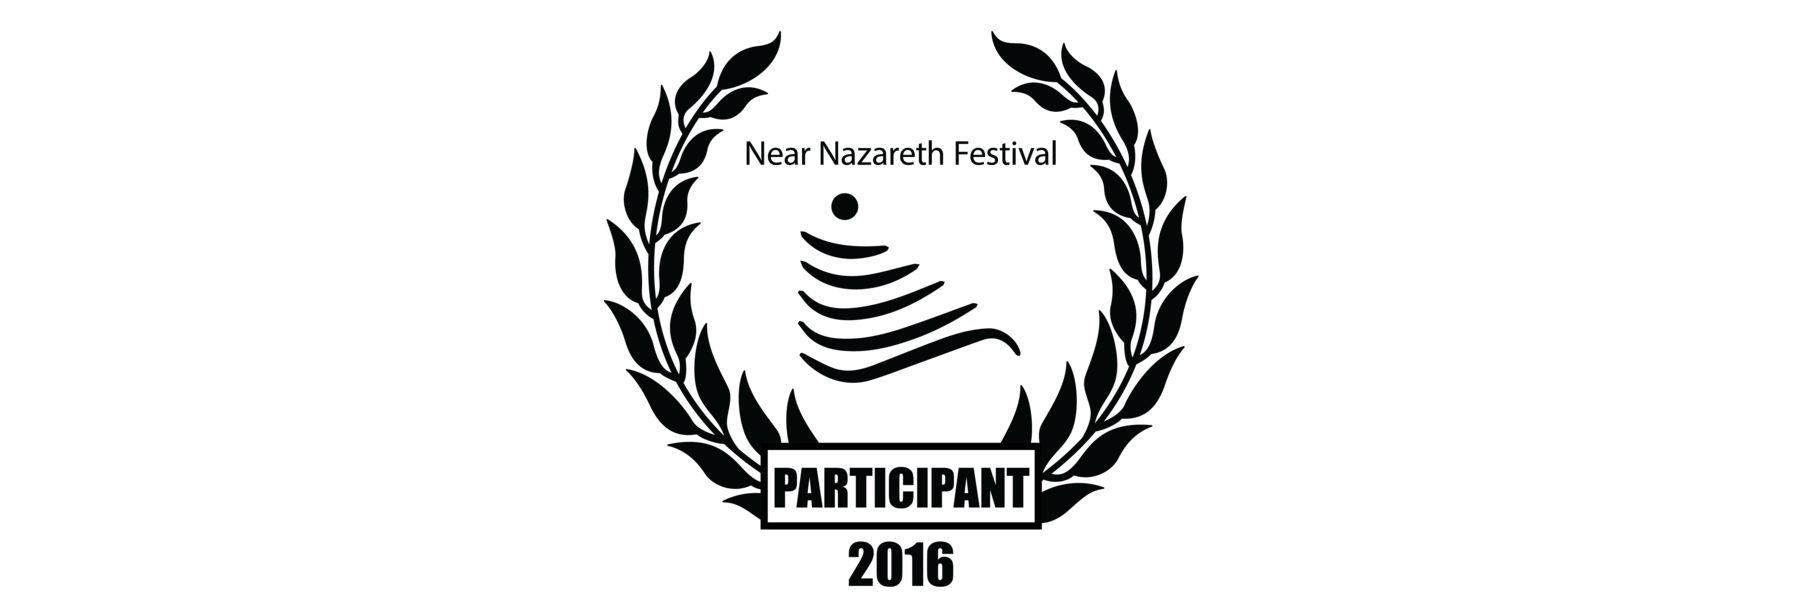 NearNazareth2016-Participant-Header